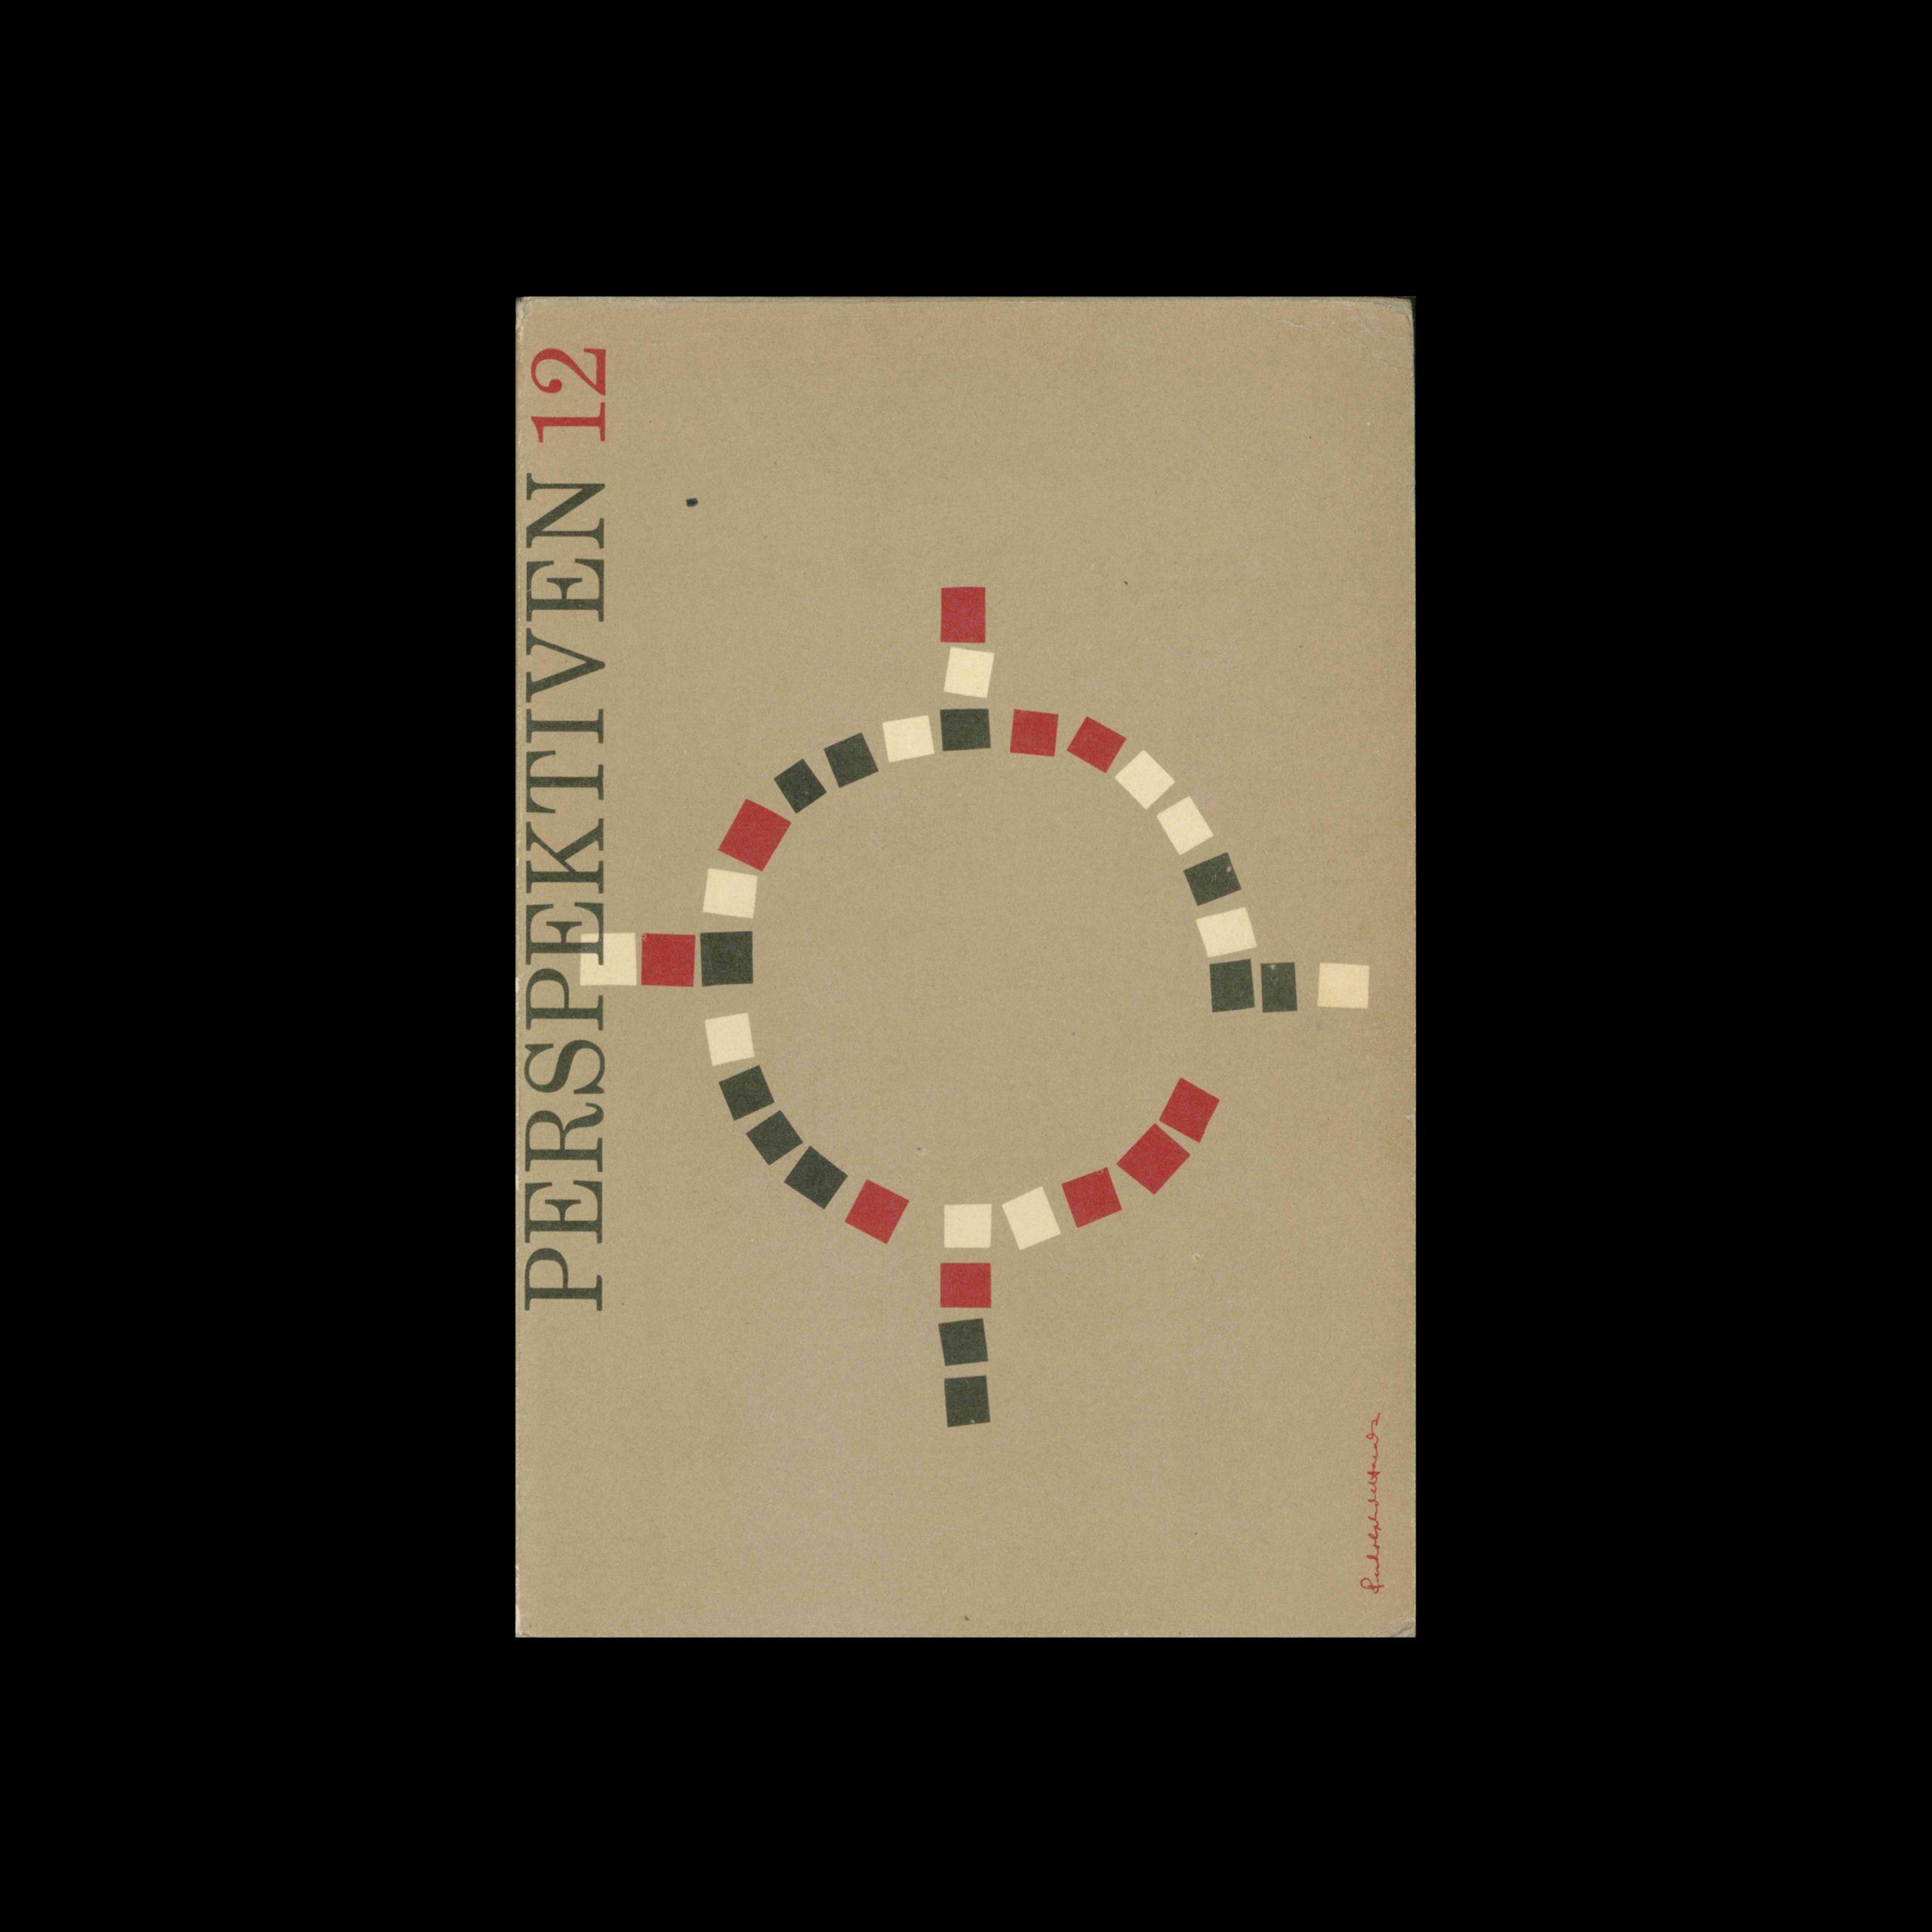 Perspektiven, Literatur, Kunst, Musik, 12, 1955. Cover design by Rudolph de Harak